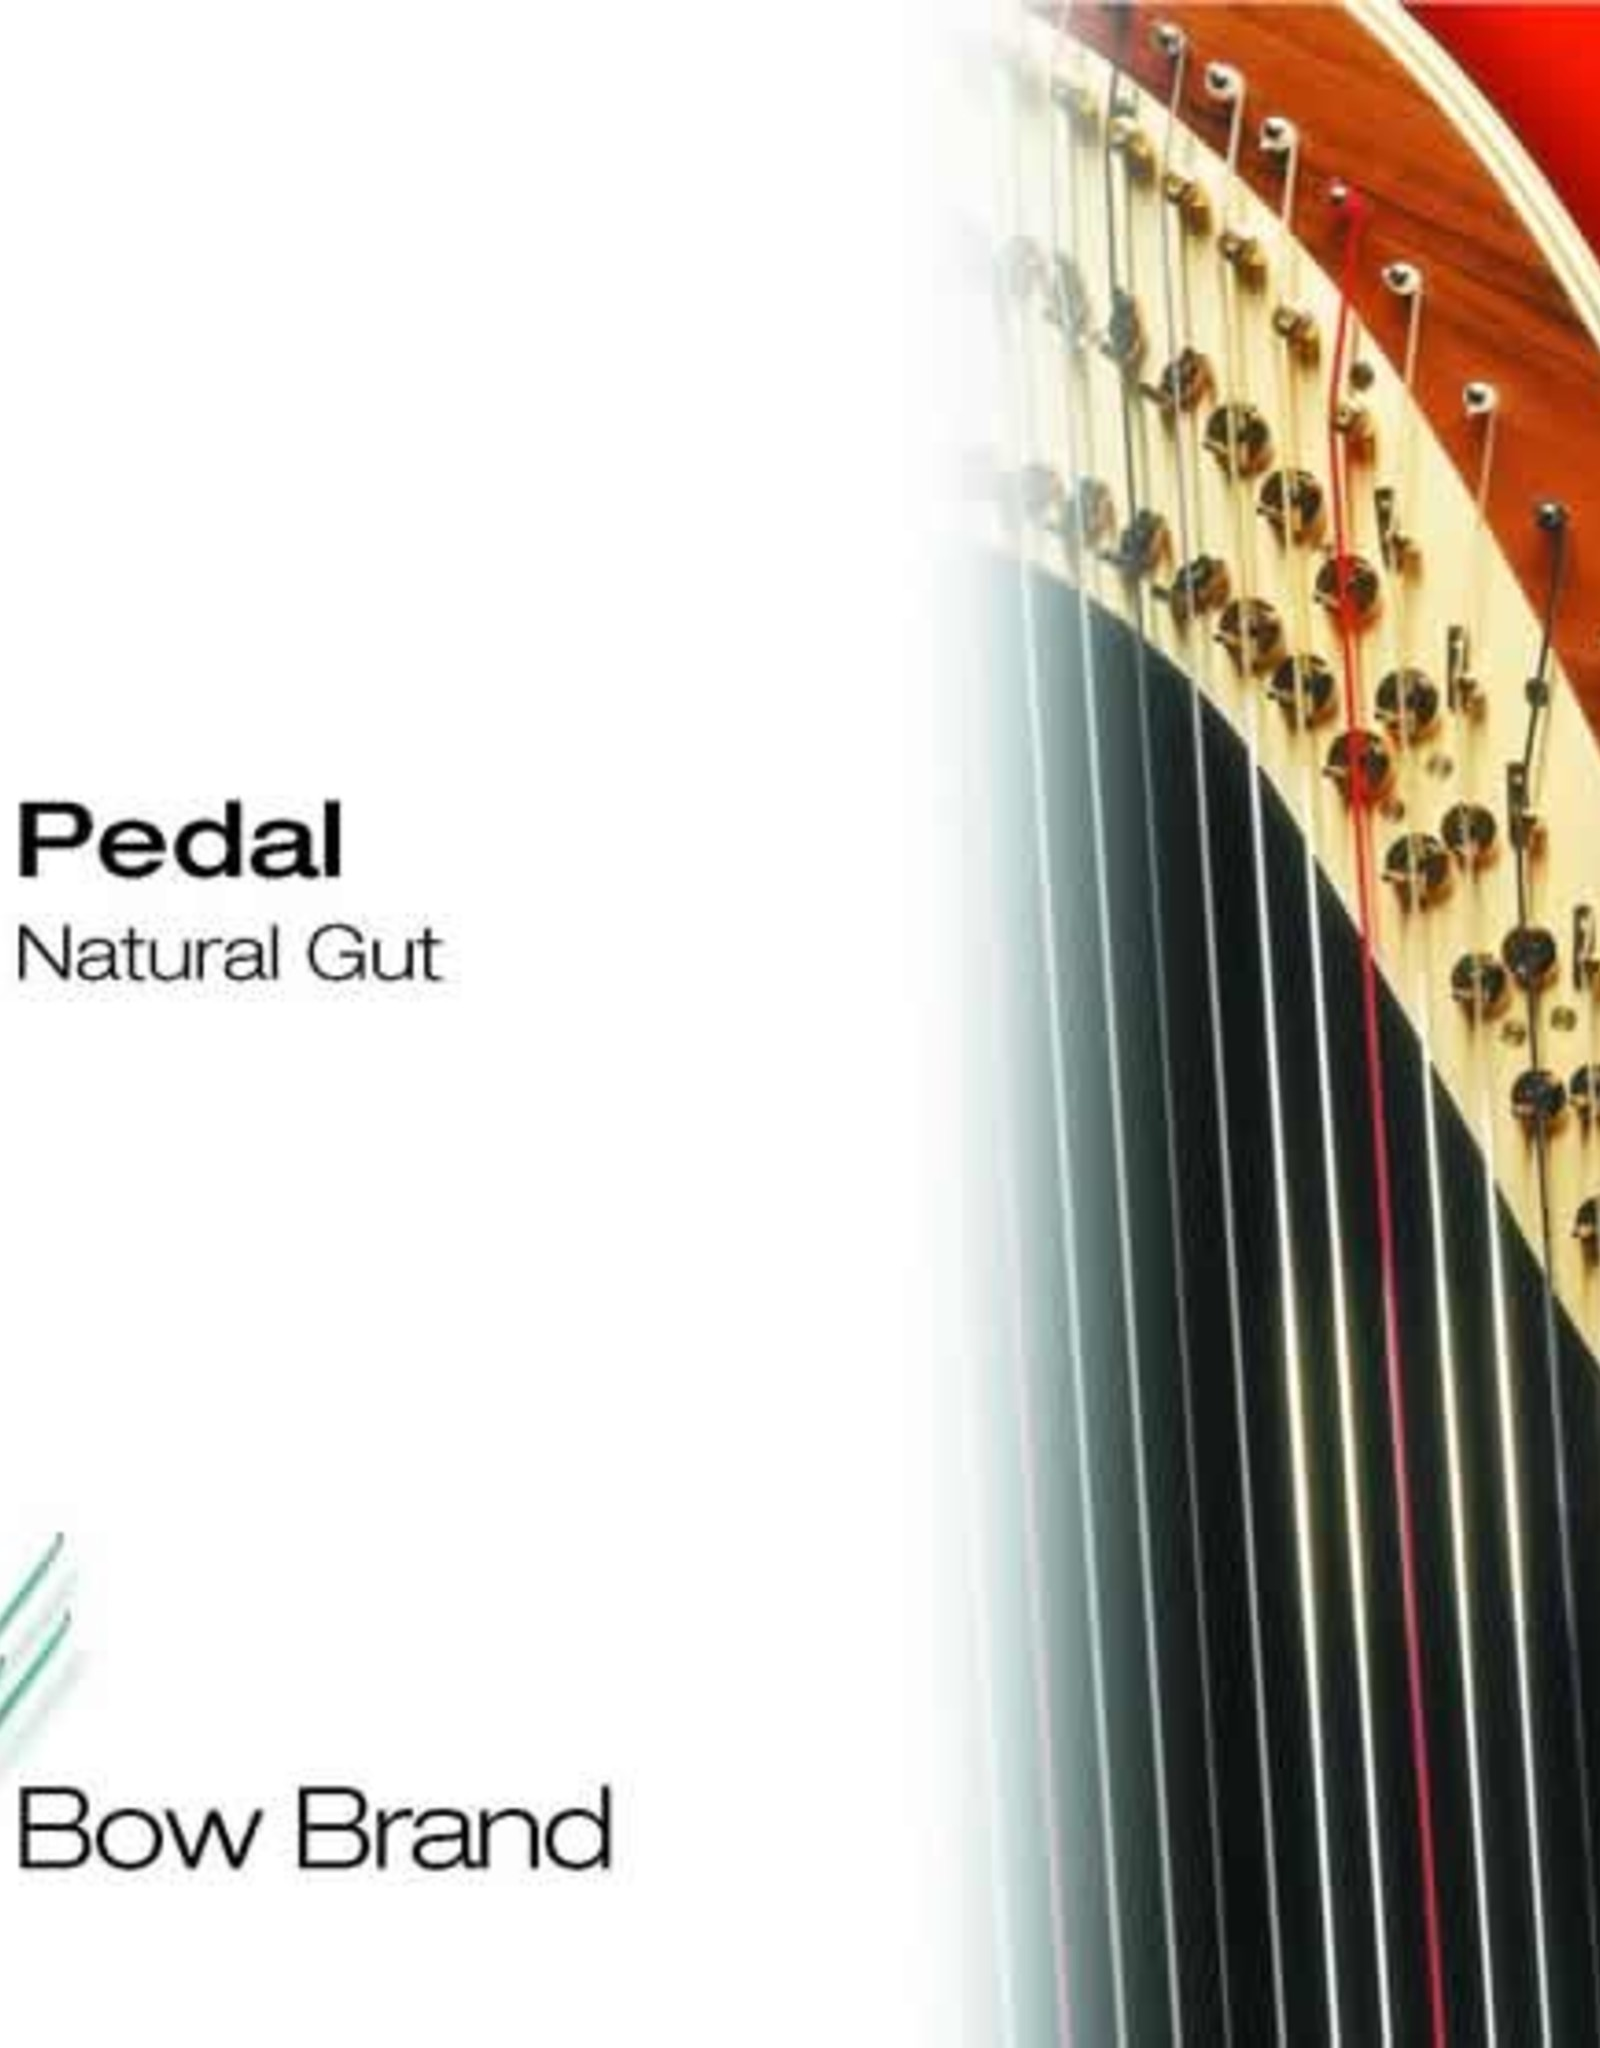 BOW BRAND  pedaal darm - pedal STD GUT 0/0 fa